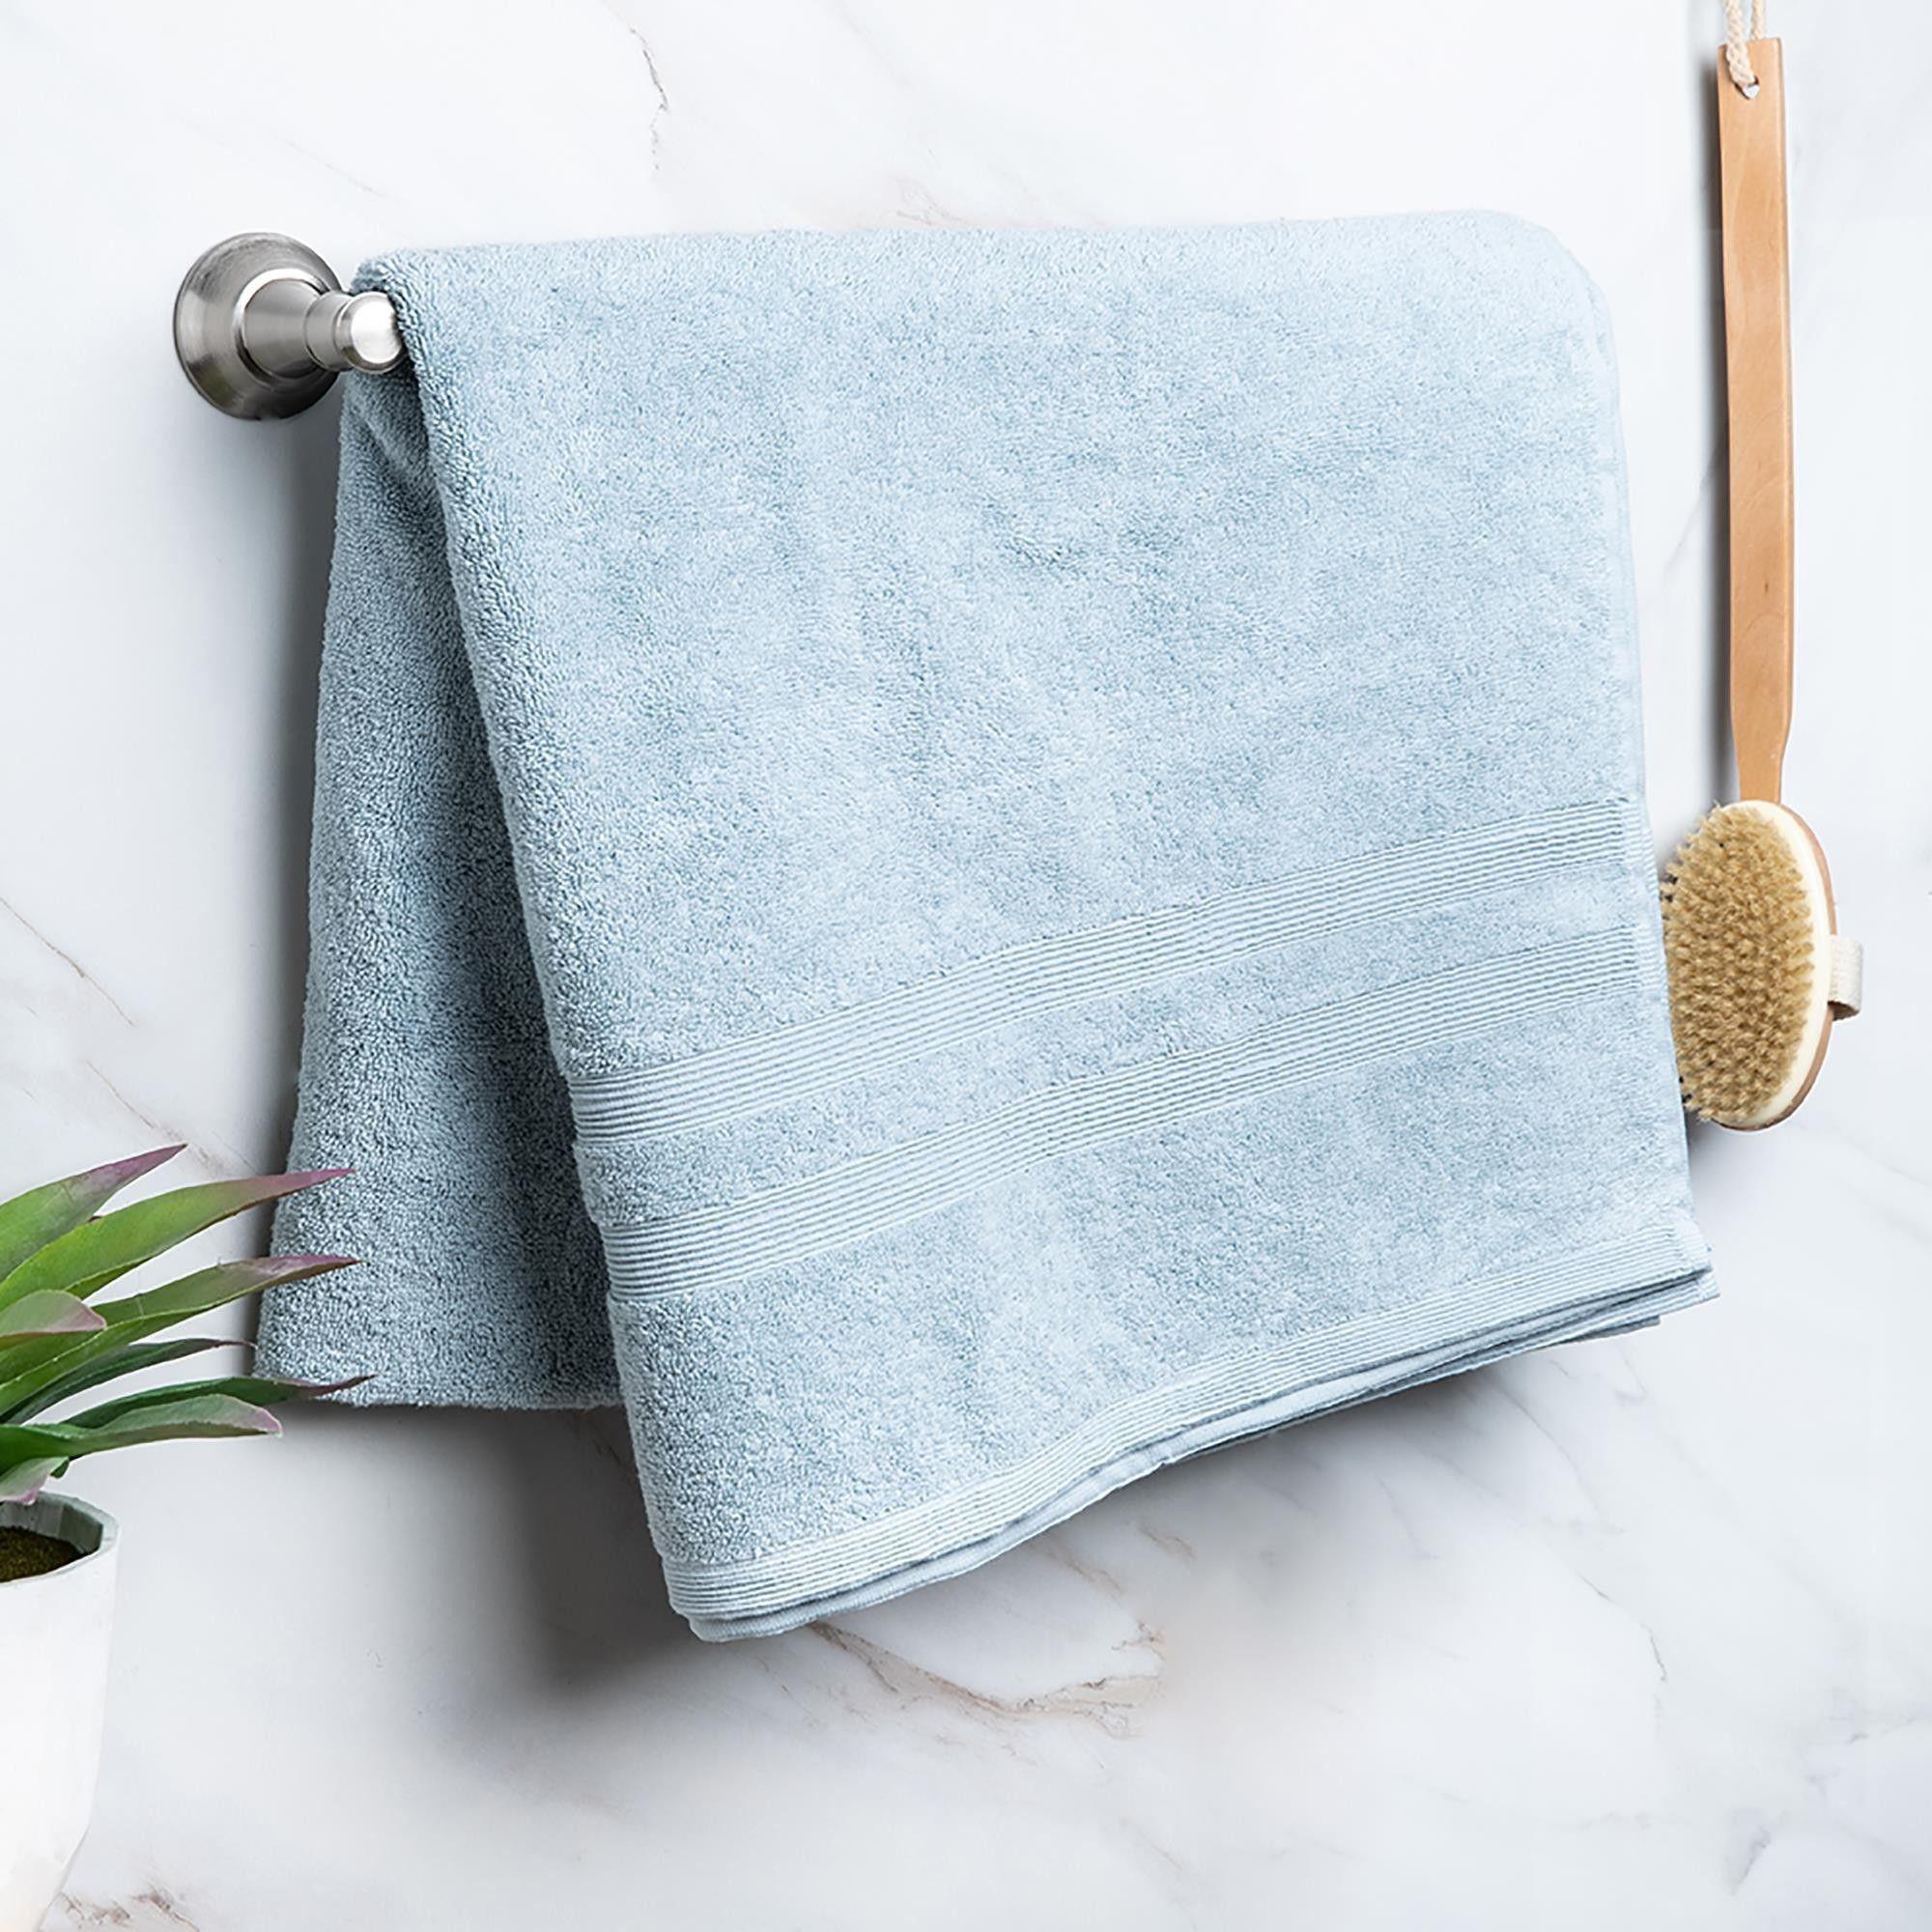 Moda At Home Allure Cotton Bath Sheet (Powder Blue) in